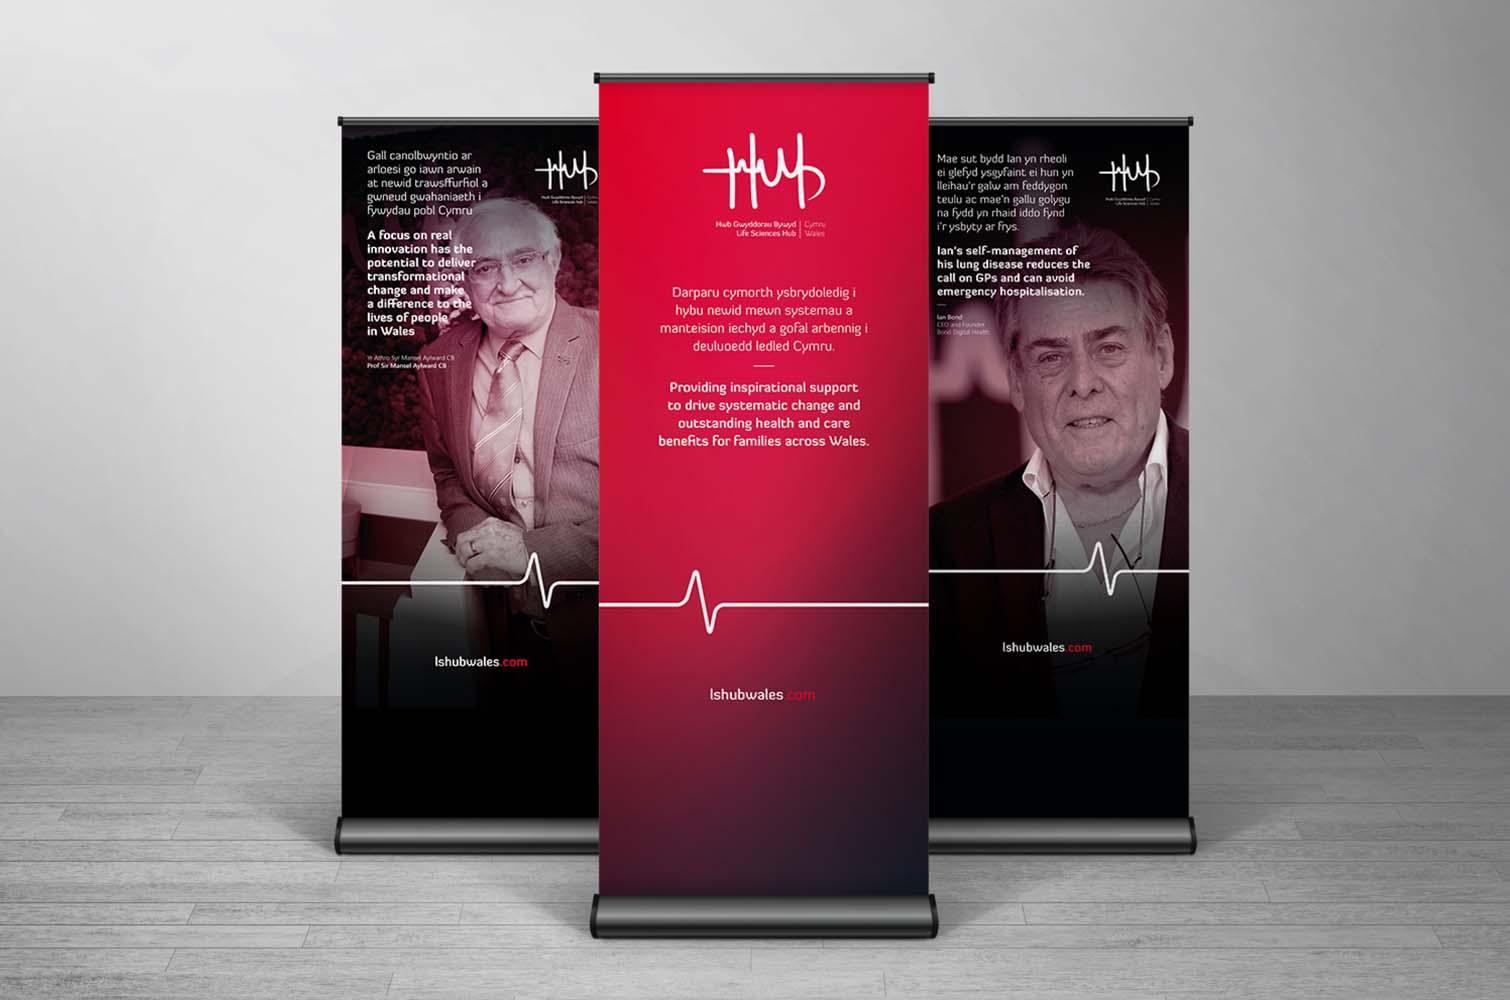 Life-Science-Hub-Wales-Case-Study6